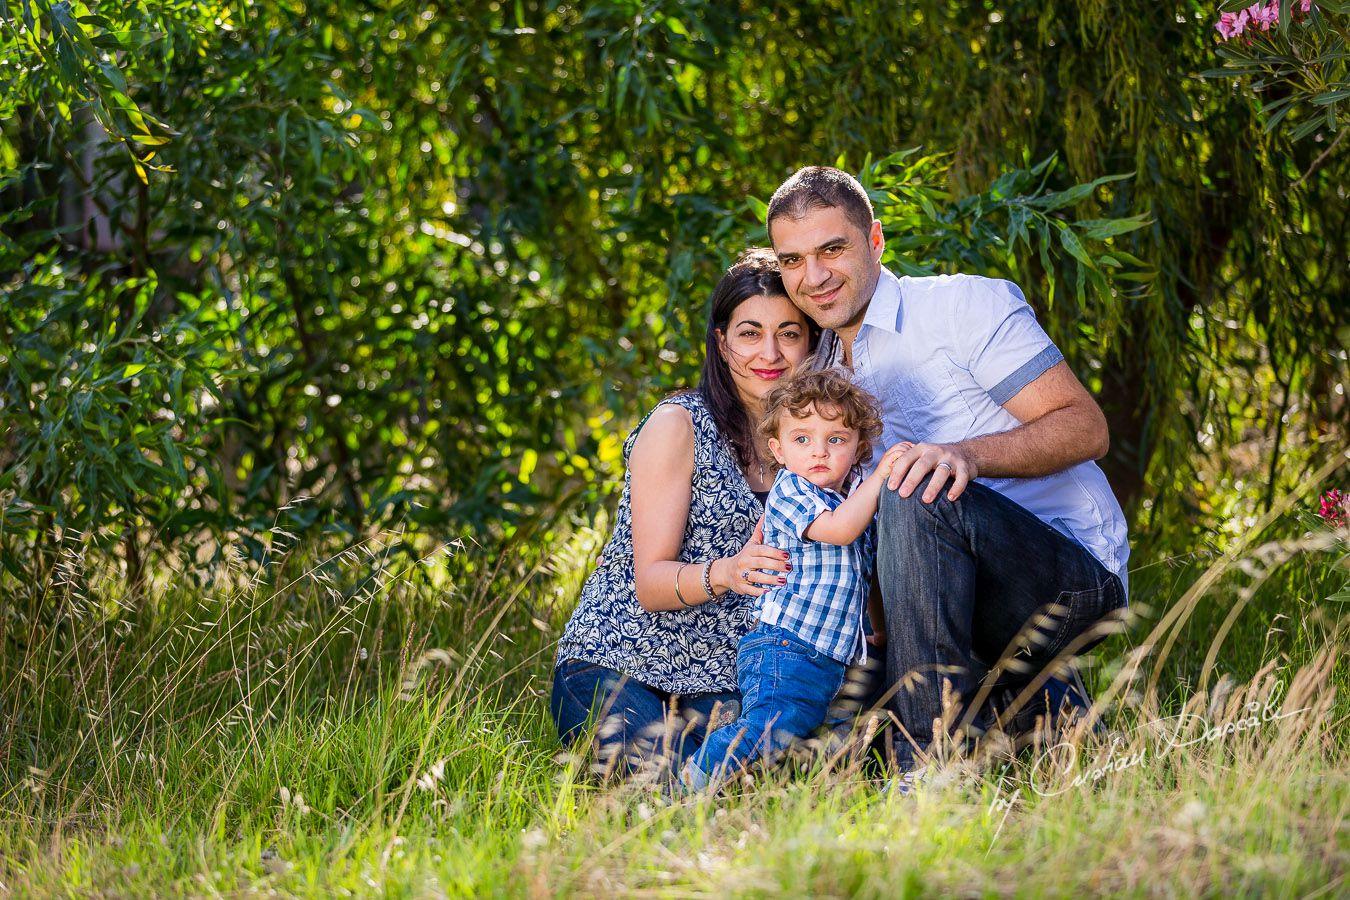 Maria, George & Harry - Family photo shoot near Curium Beach, Cyprus. Photographer: Cristian Dascalu